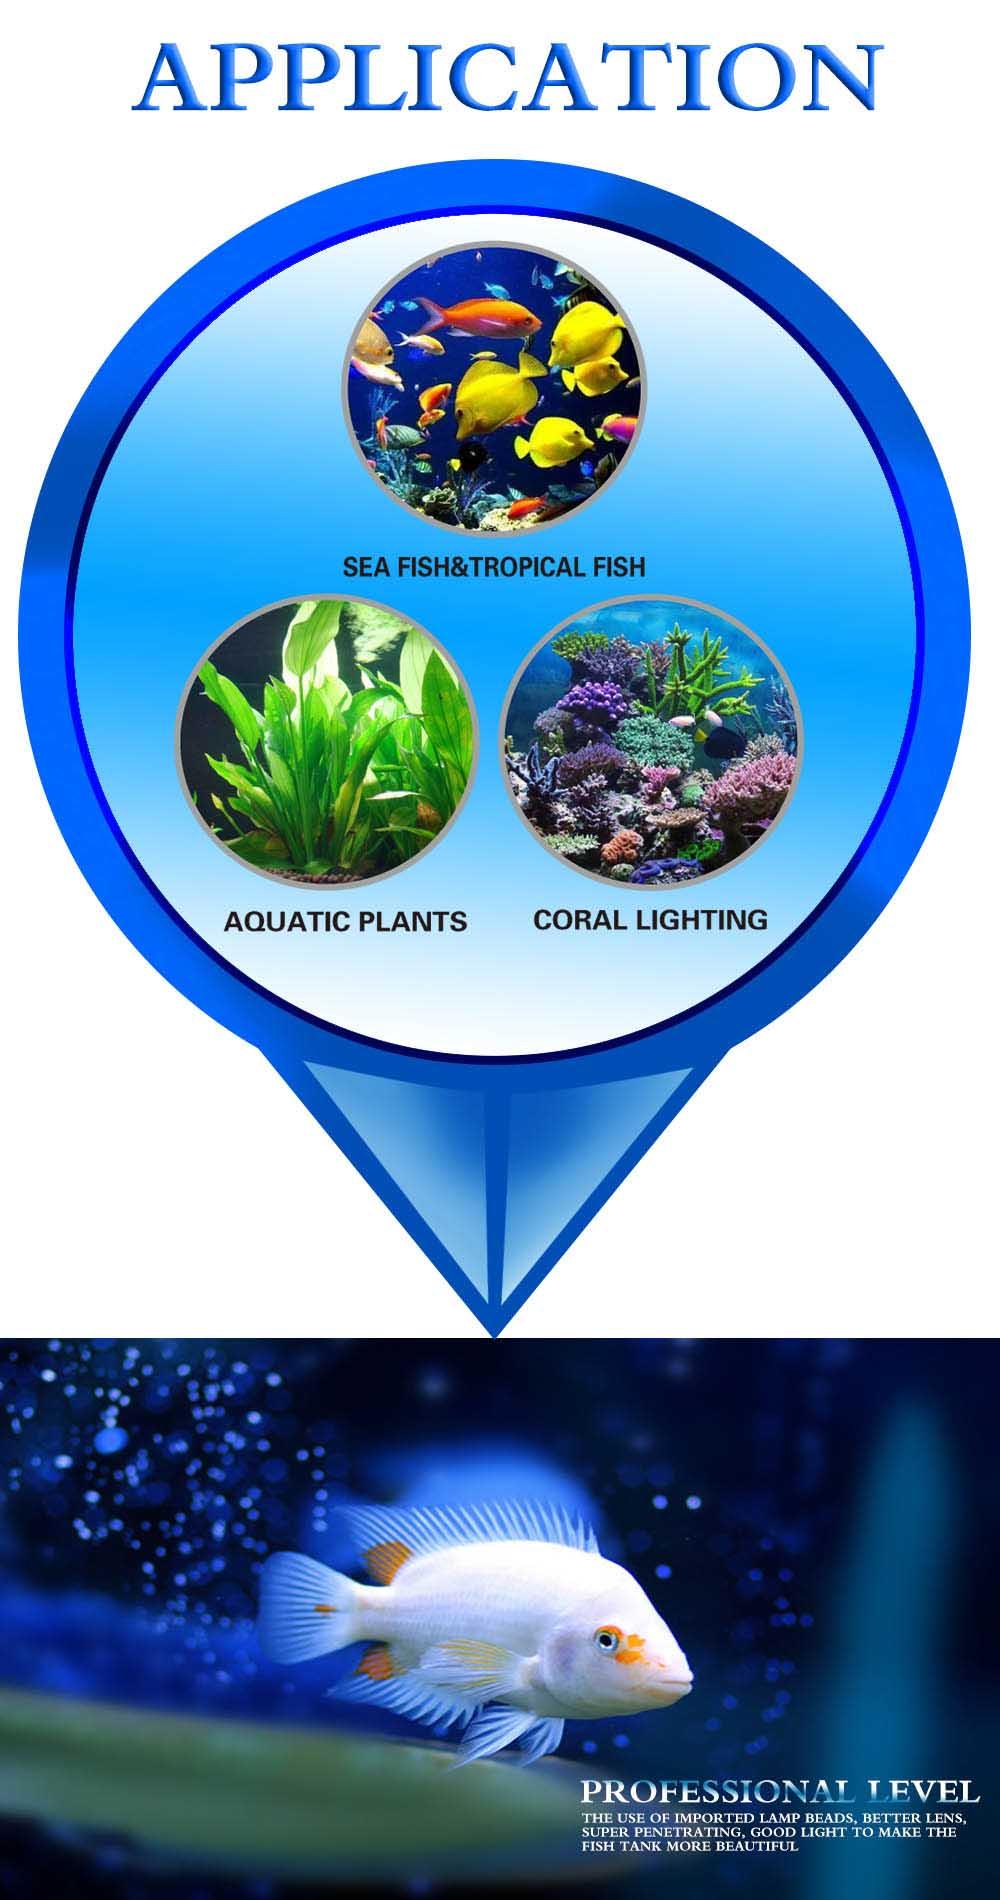 Aquarium led lighting Dimmable lamp Fish bowl light Marine Fish tank Coral lights High brightness Penetrating strong FCC CE ROHS (3)